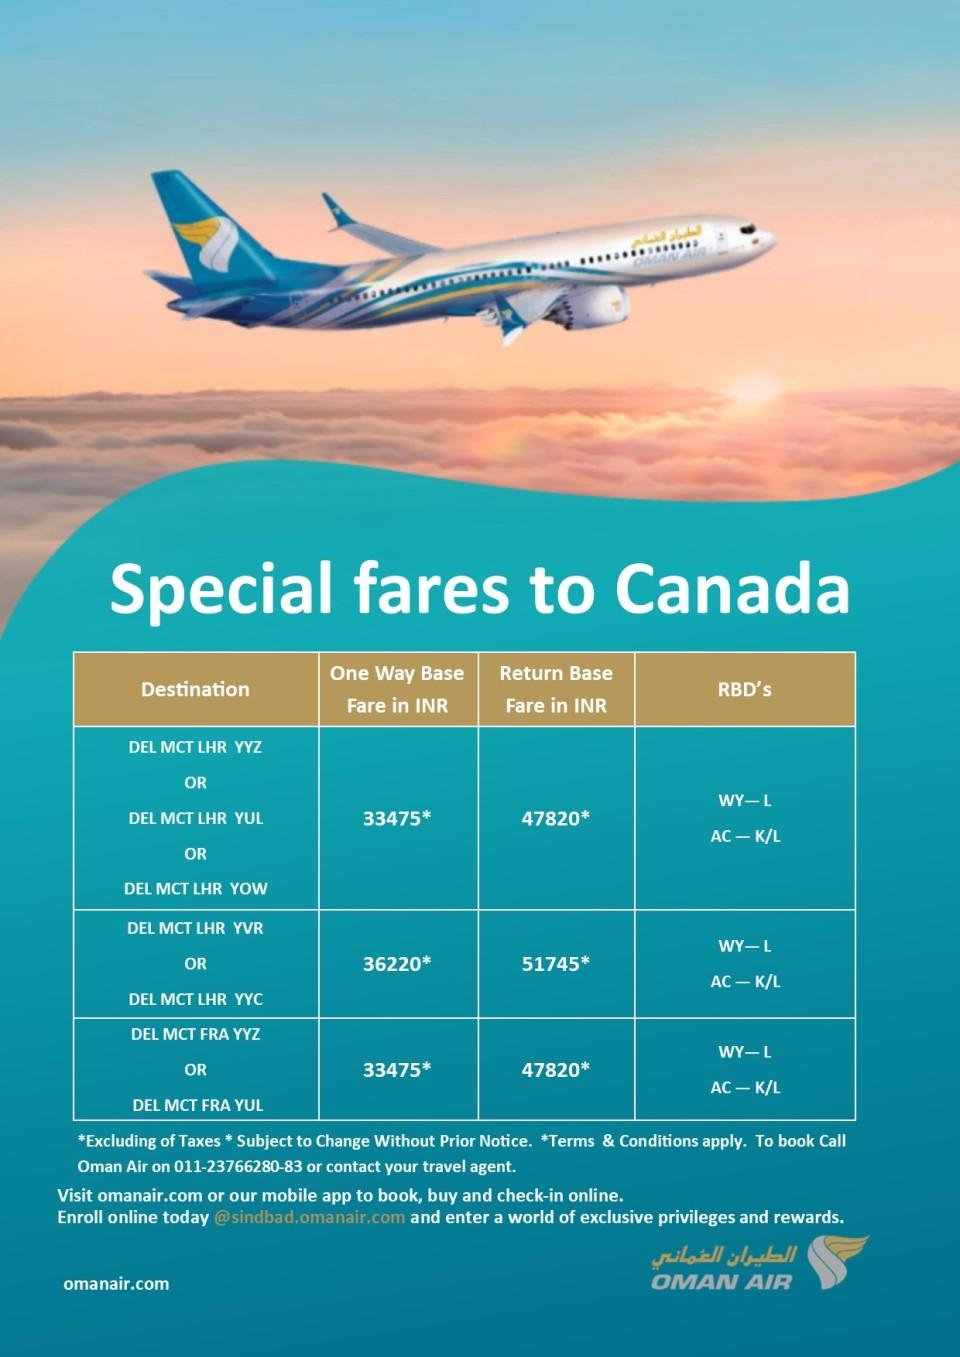 Fare to Canada as on 24 Jan 2019_English.jpg